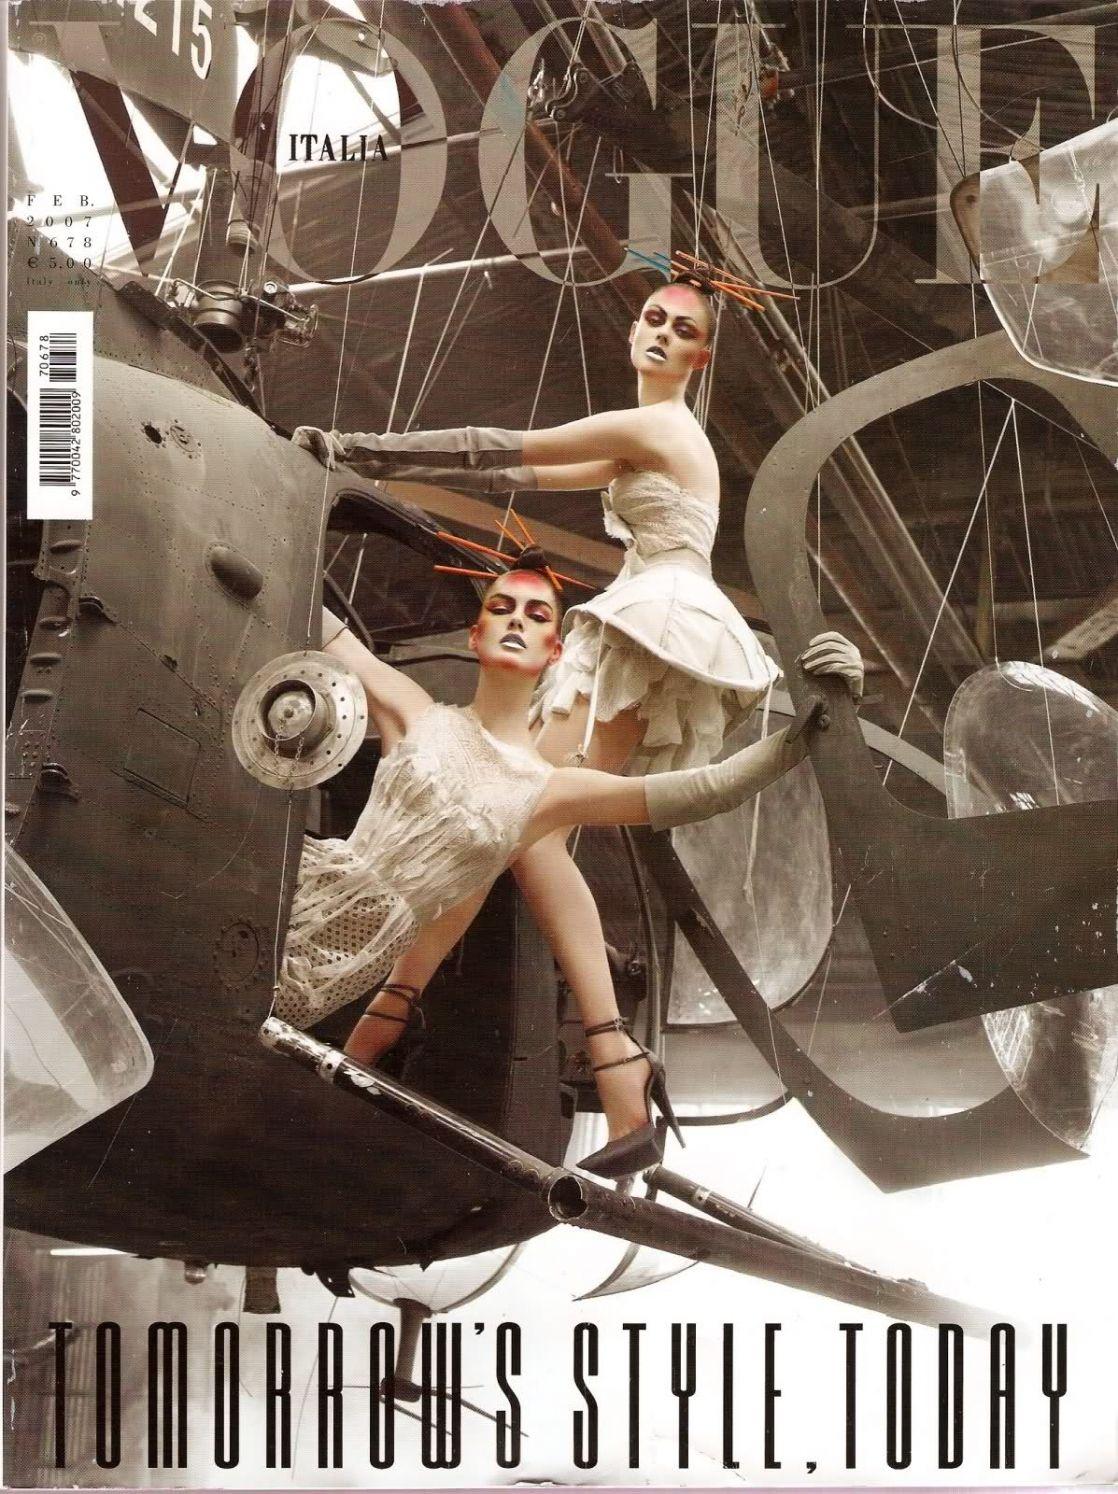 Fashionmonger - Página 19 C6716a3db9e47aaa8232925de00035a2